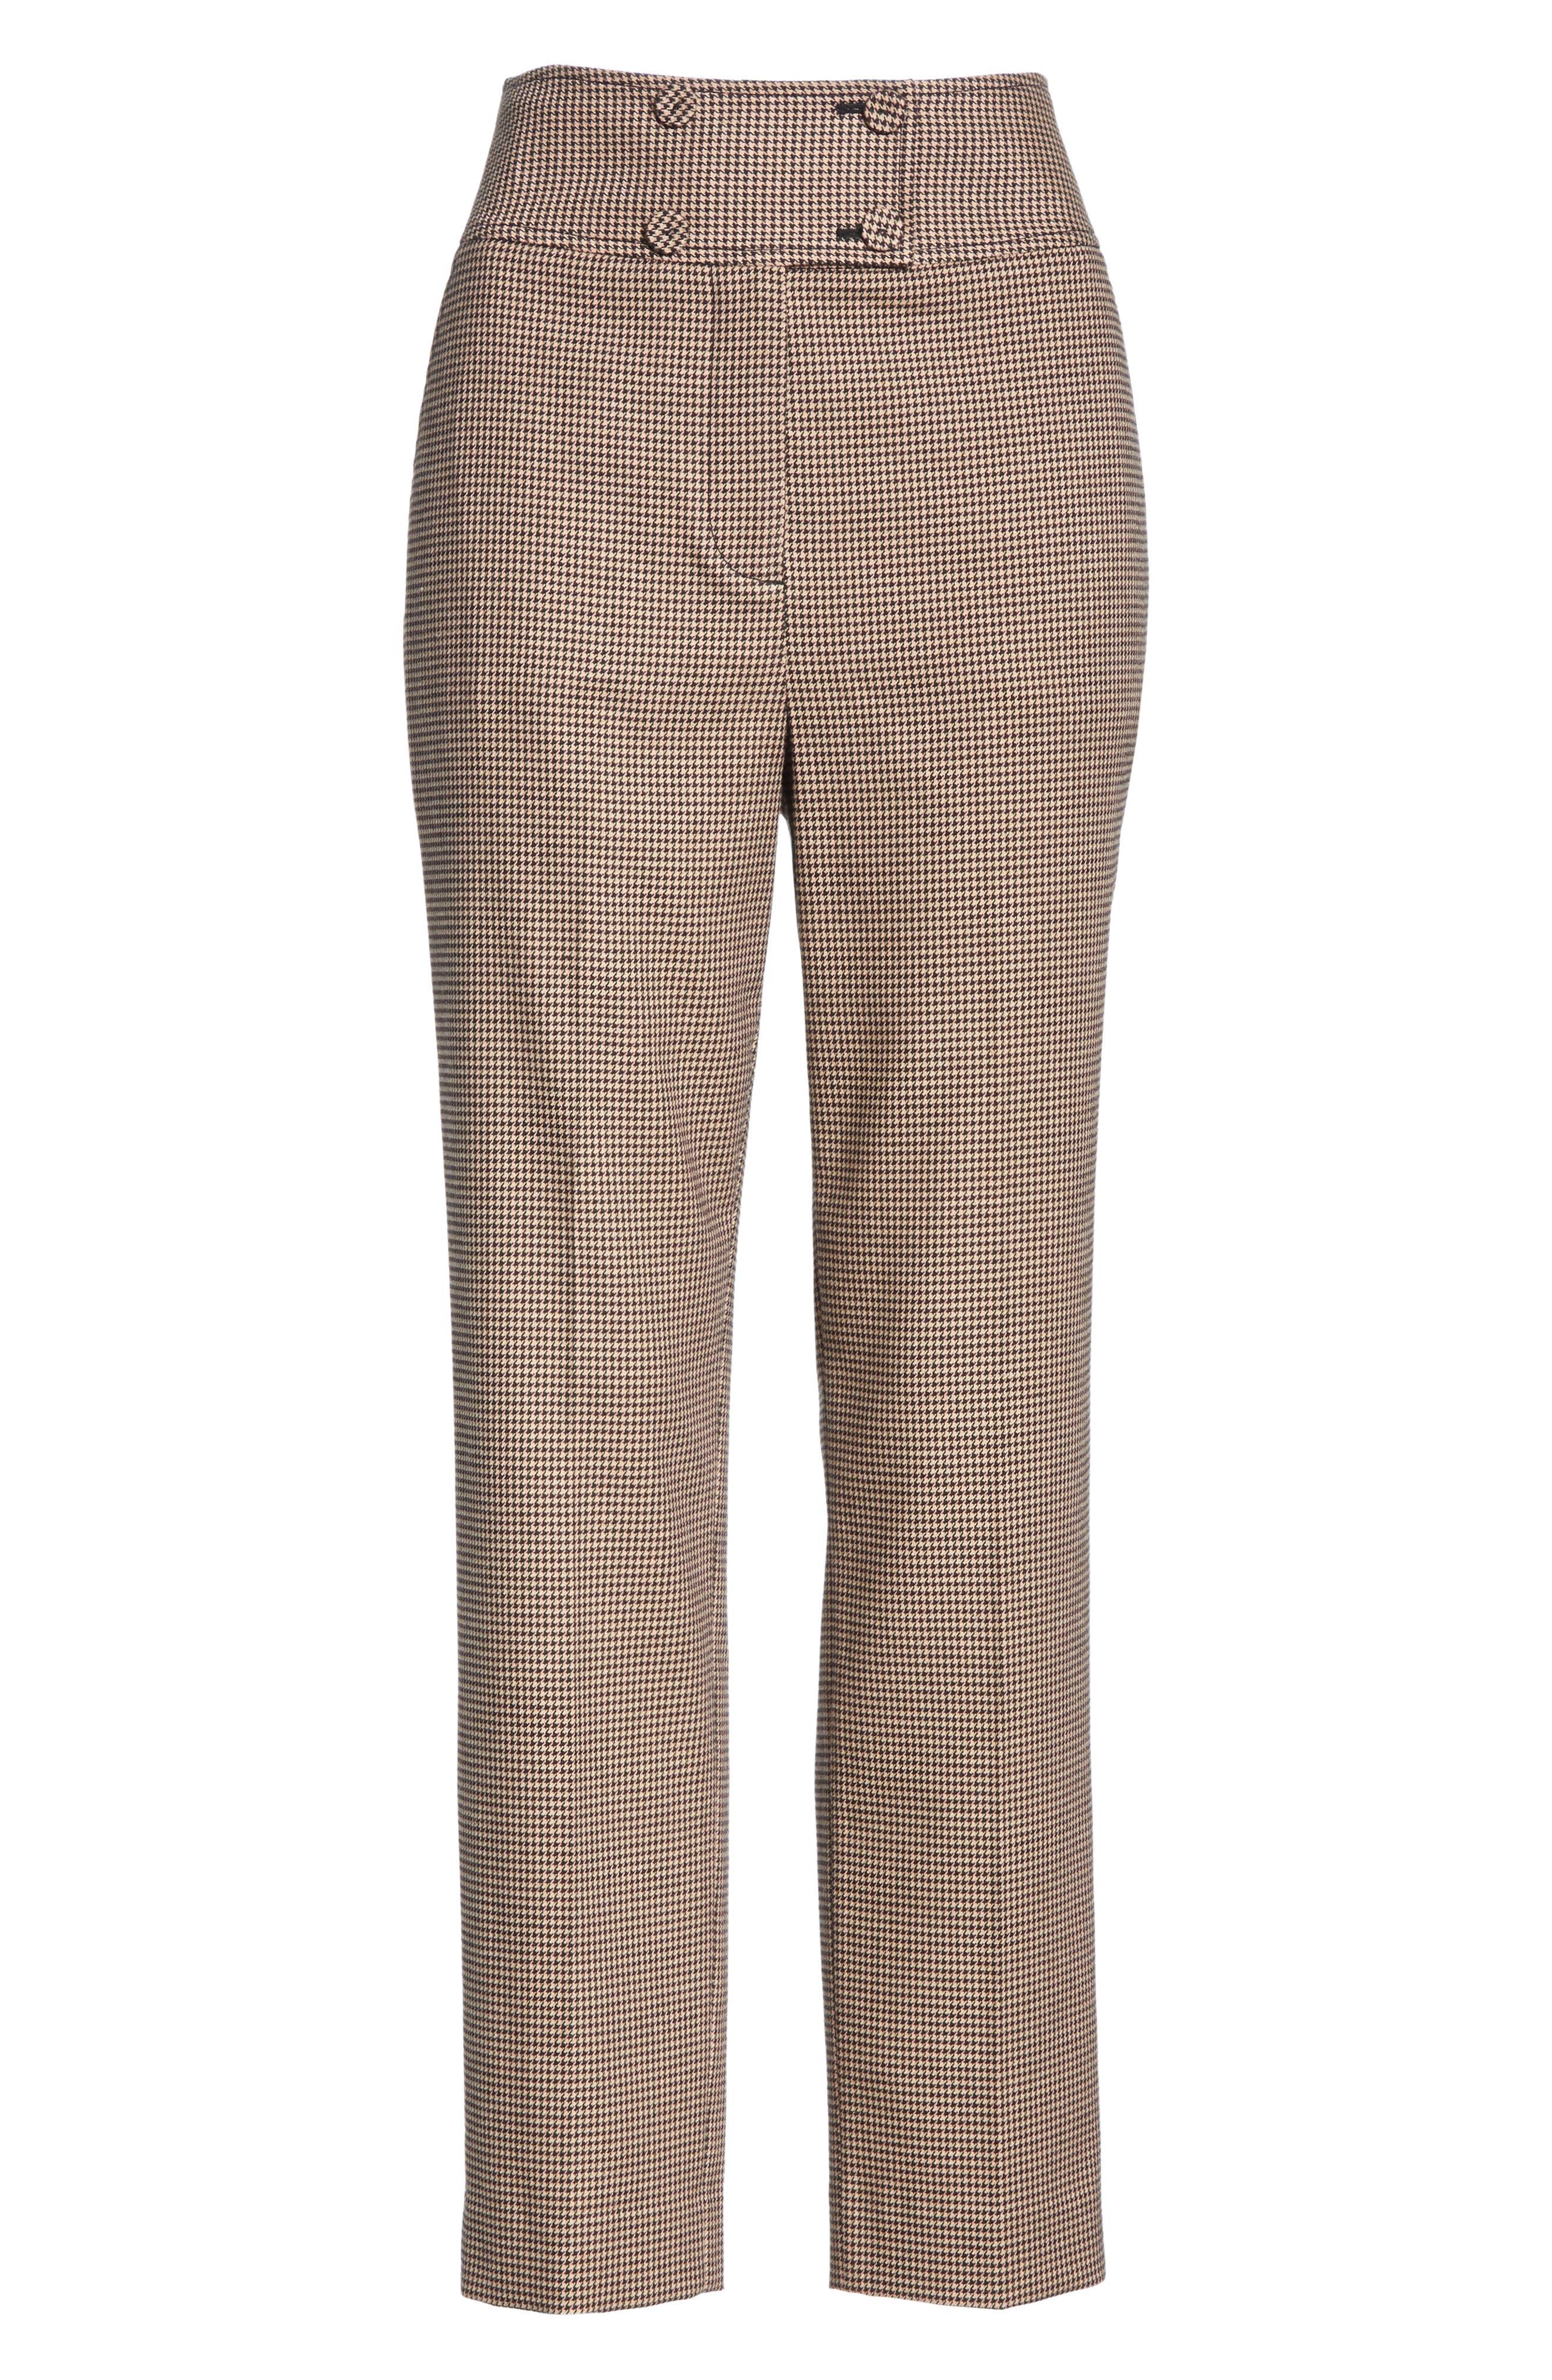 Houndstooth Check Stretch Cotton Blend Pants,                             Alternate thumbnail 6, color,                             CAMEL/ BLACK